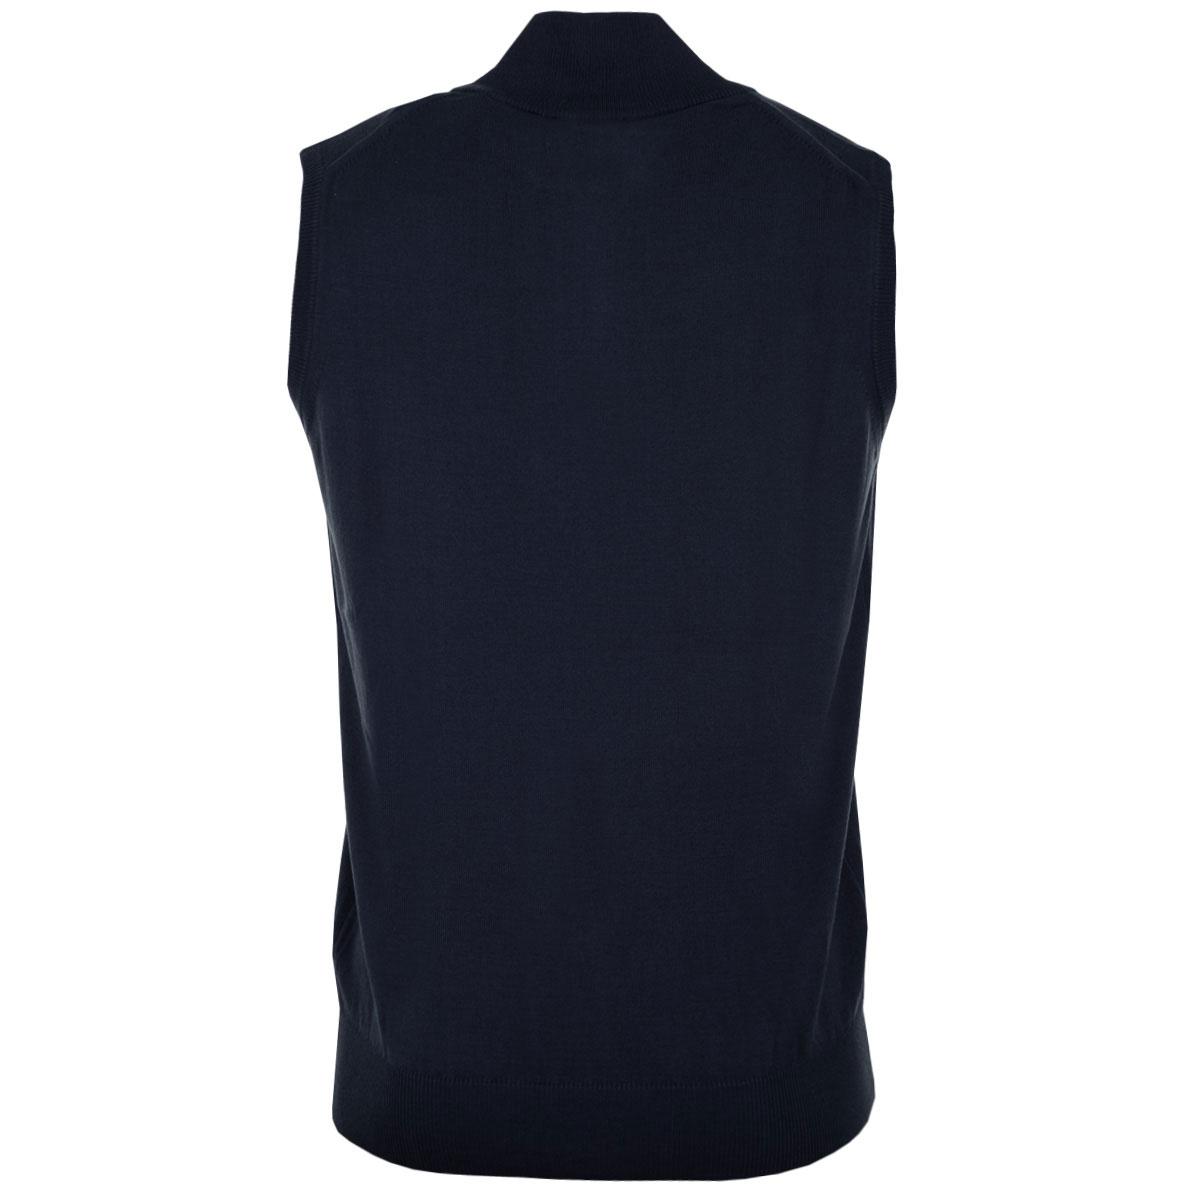 Calvin-Klein-Golf-Mens-CK-1-4-Zip-Sleeveless-Sweater-Vest-Gilet-27-OFF-RRP thumbnail 17